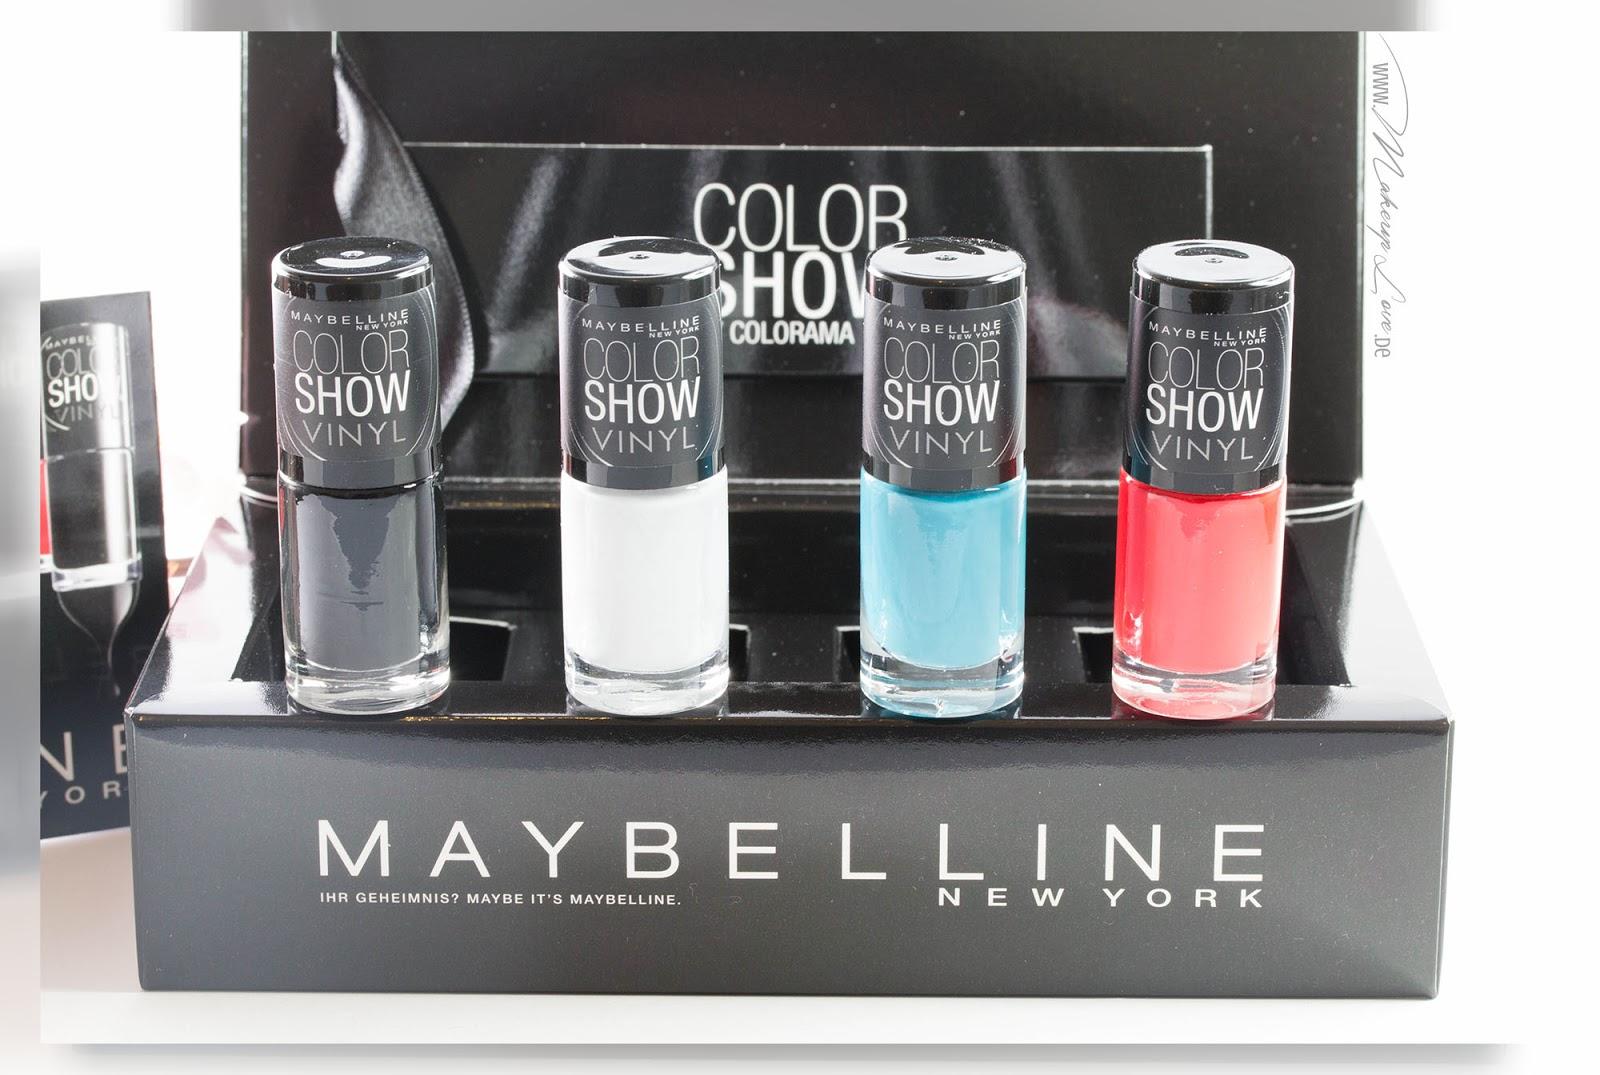 Maybelline coloshow vinyl nagellacke kollektion